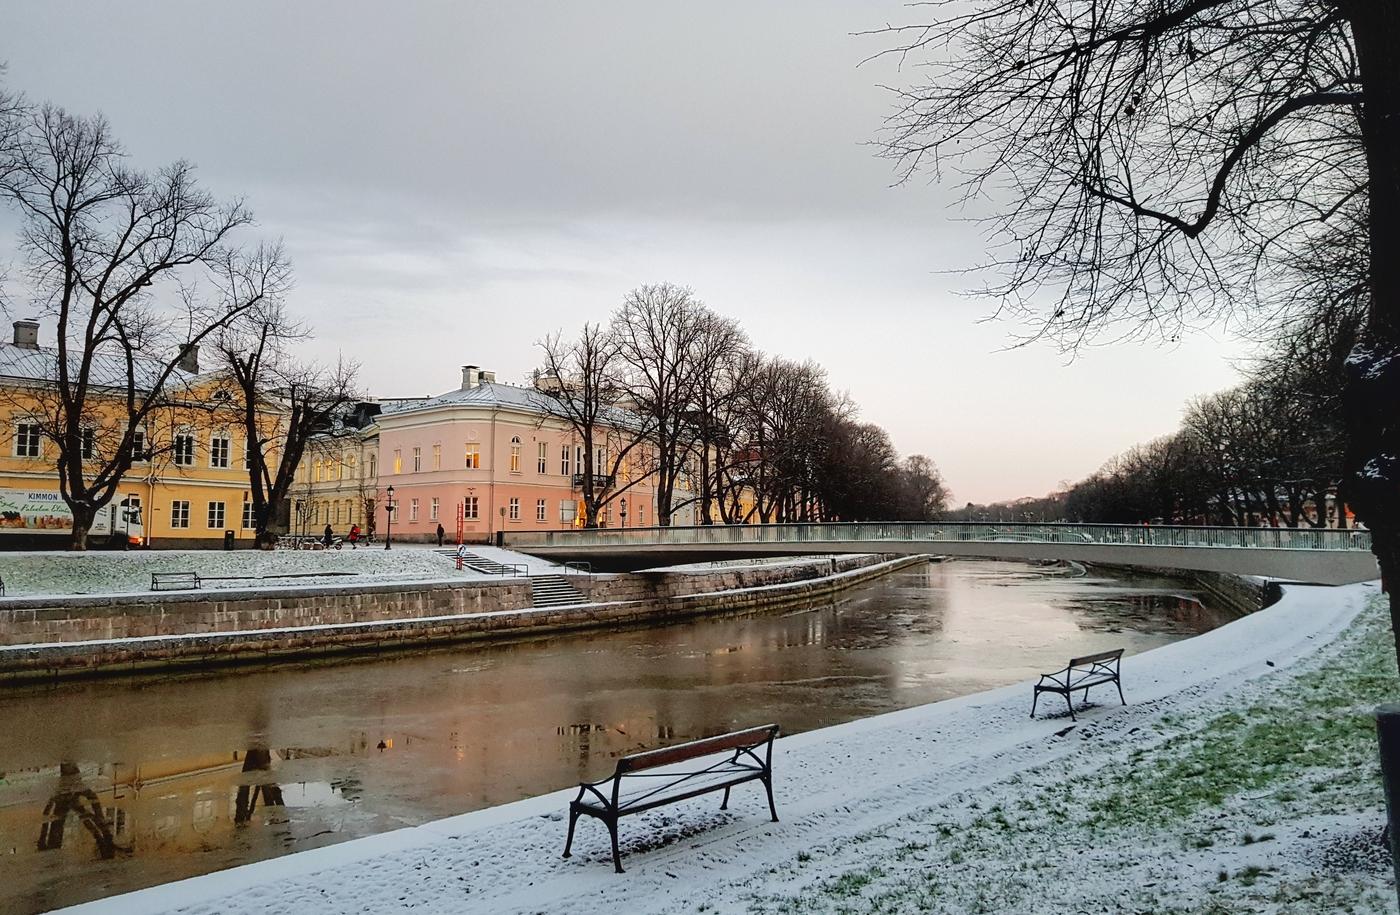 turku_talvi_suomi_finland_winter.jpeg